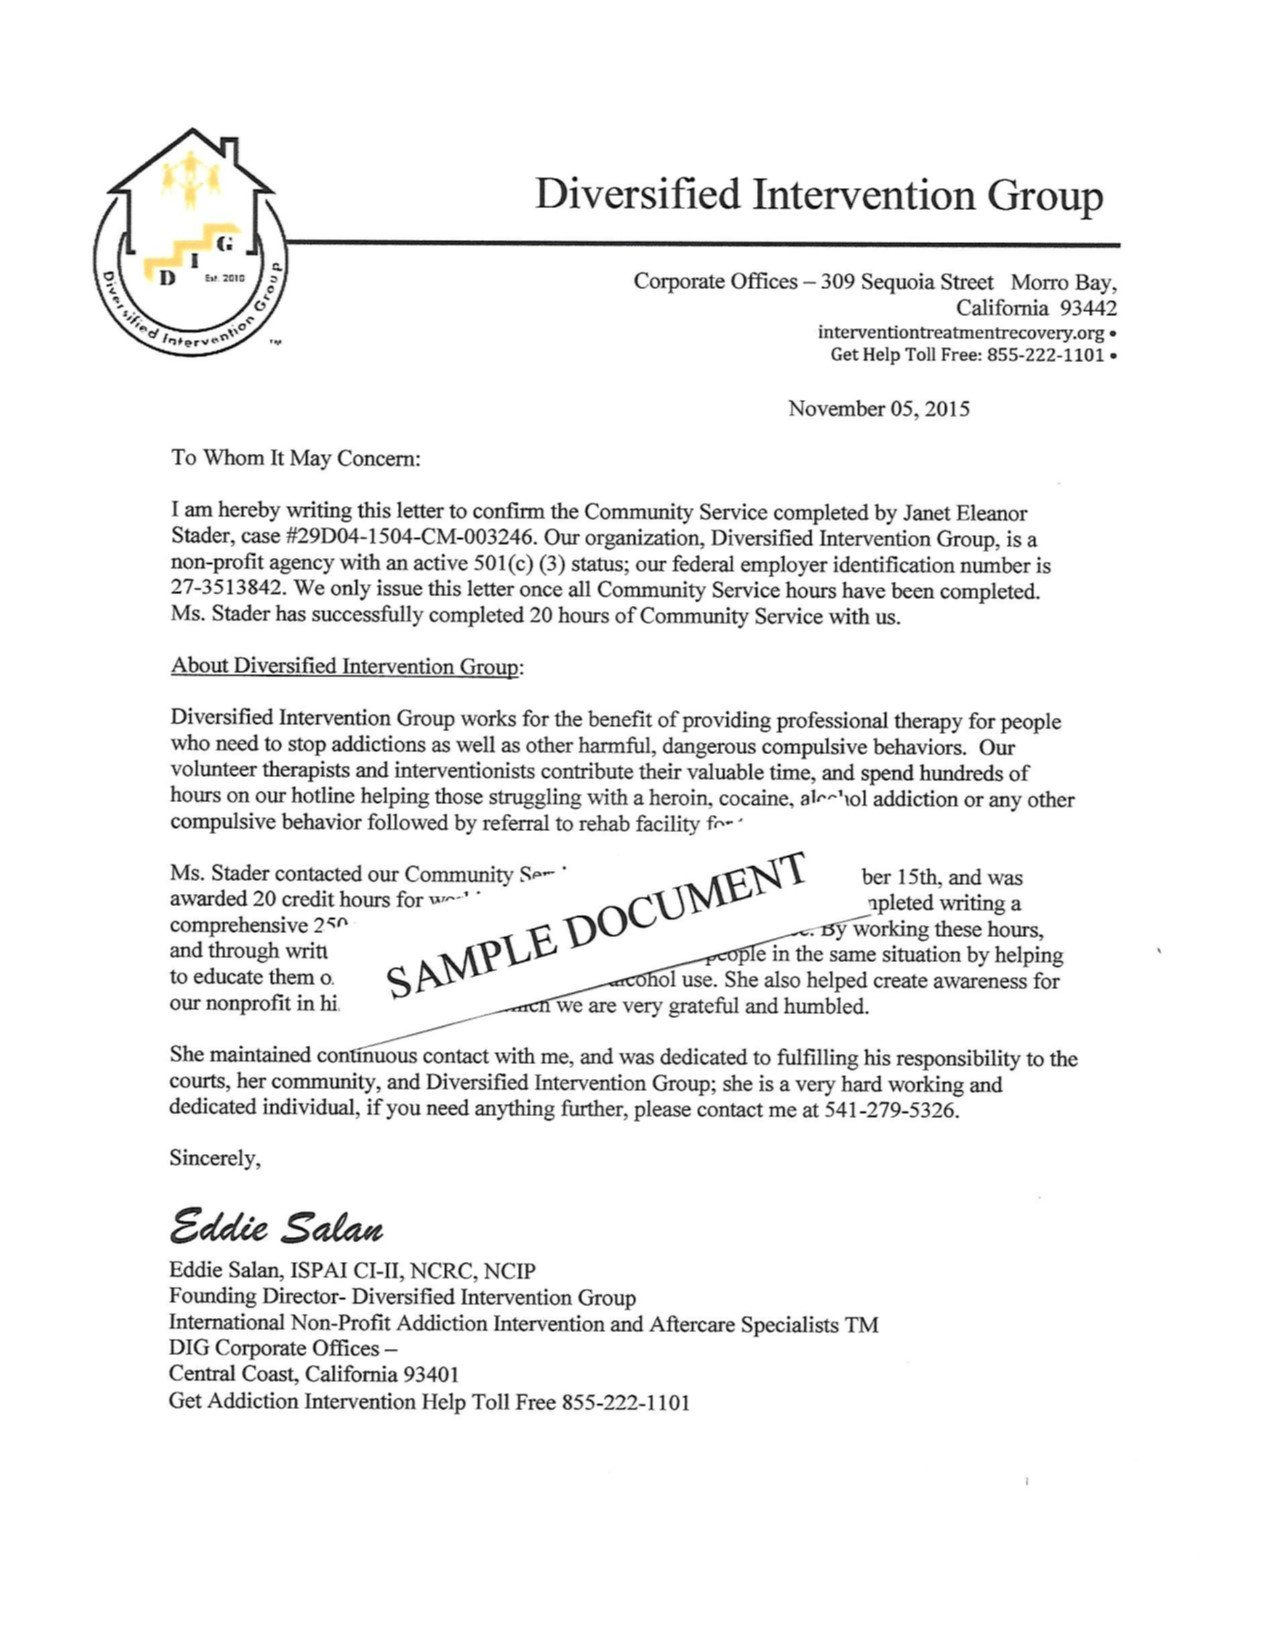 Sample Community Service Letter Munity Service Letterhead Sample